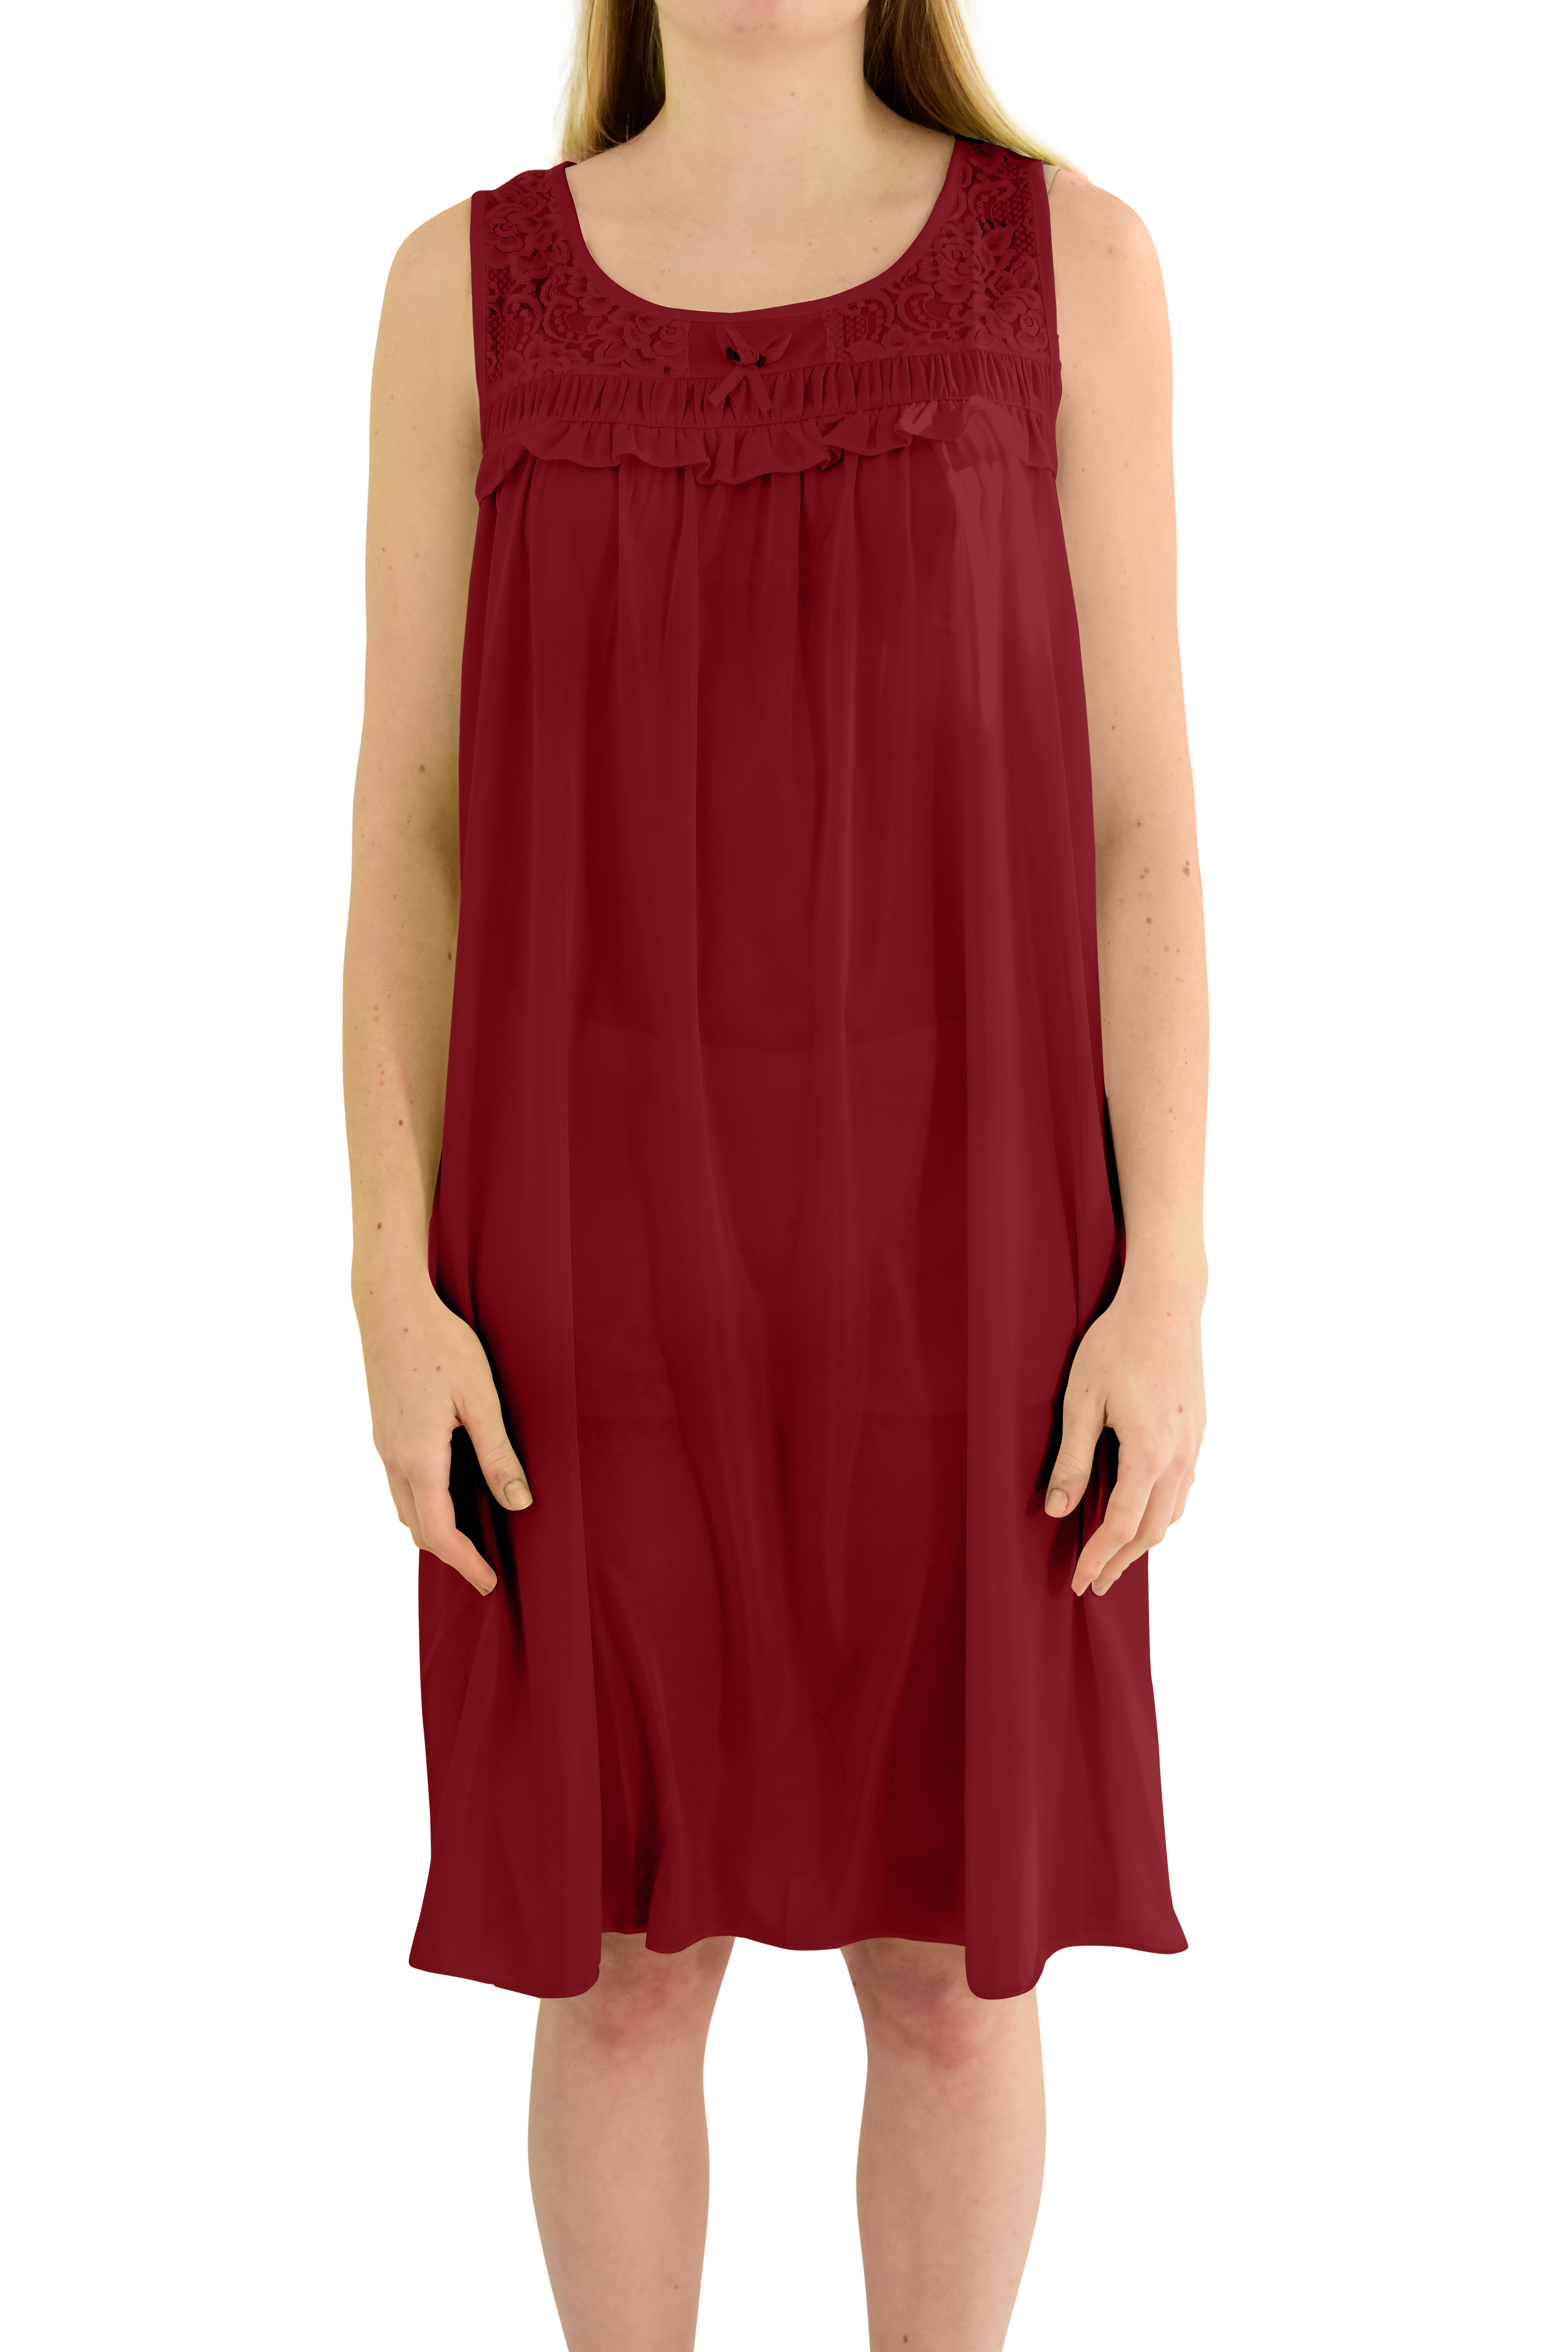 EZI Women's 'Regina' Sleeveless Satin Nightgown